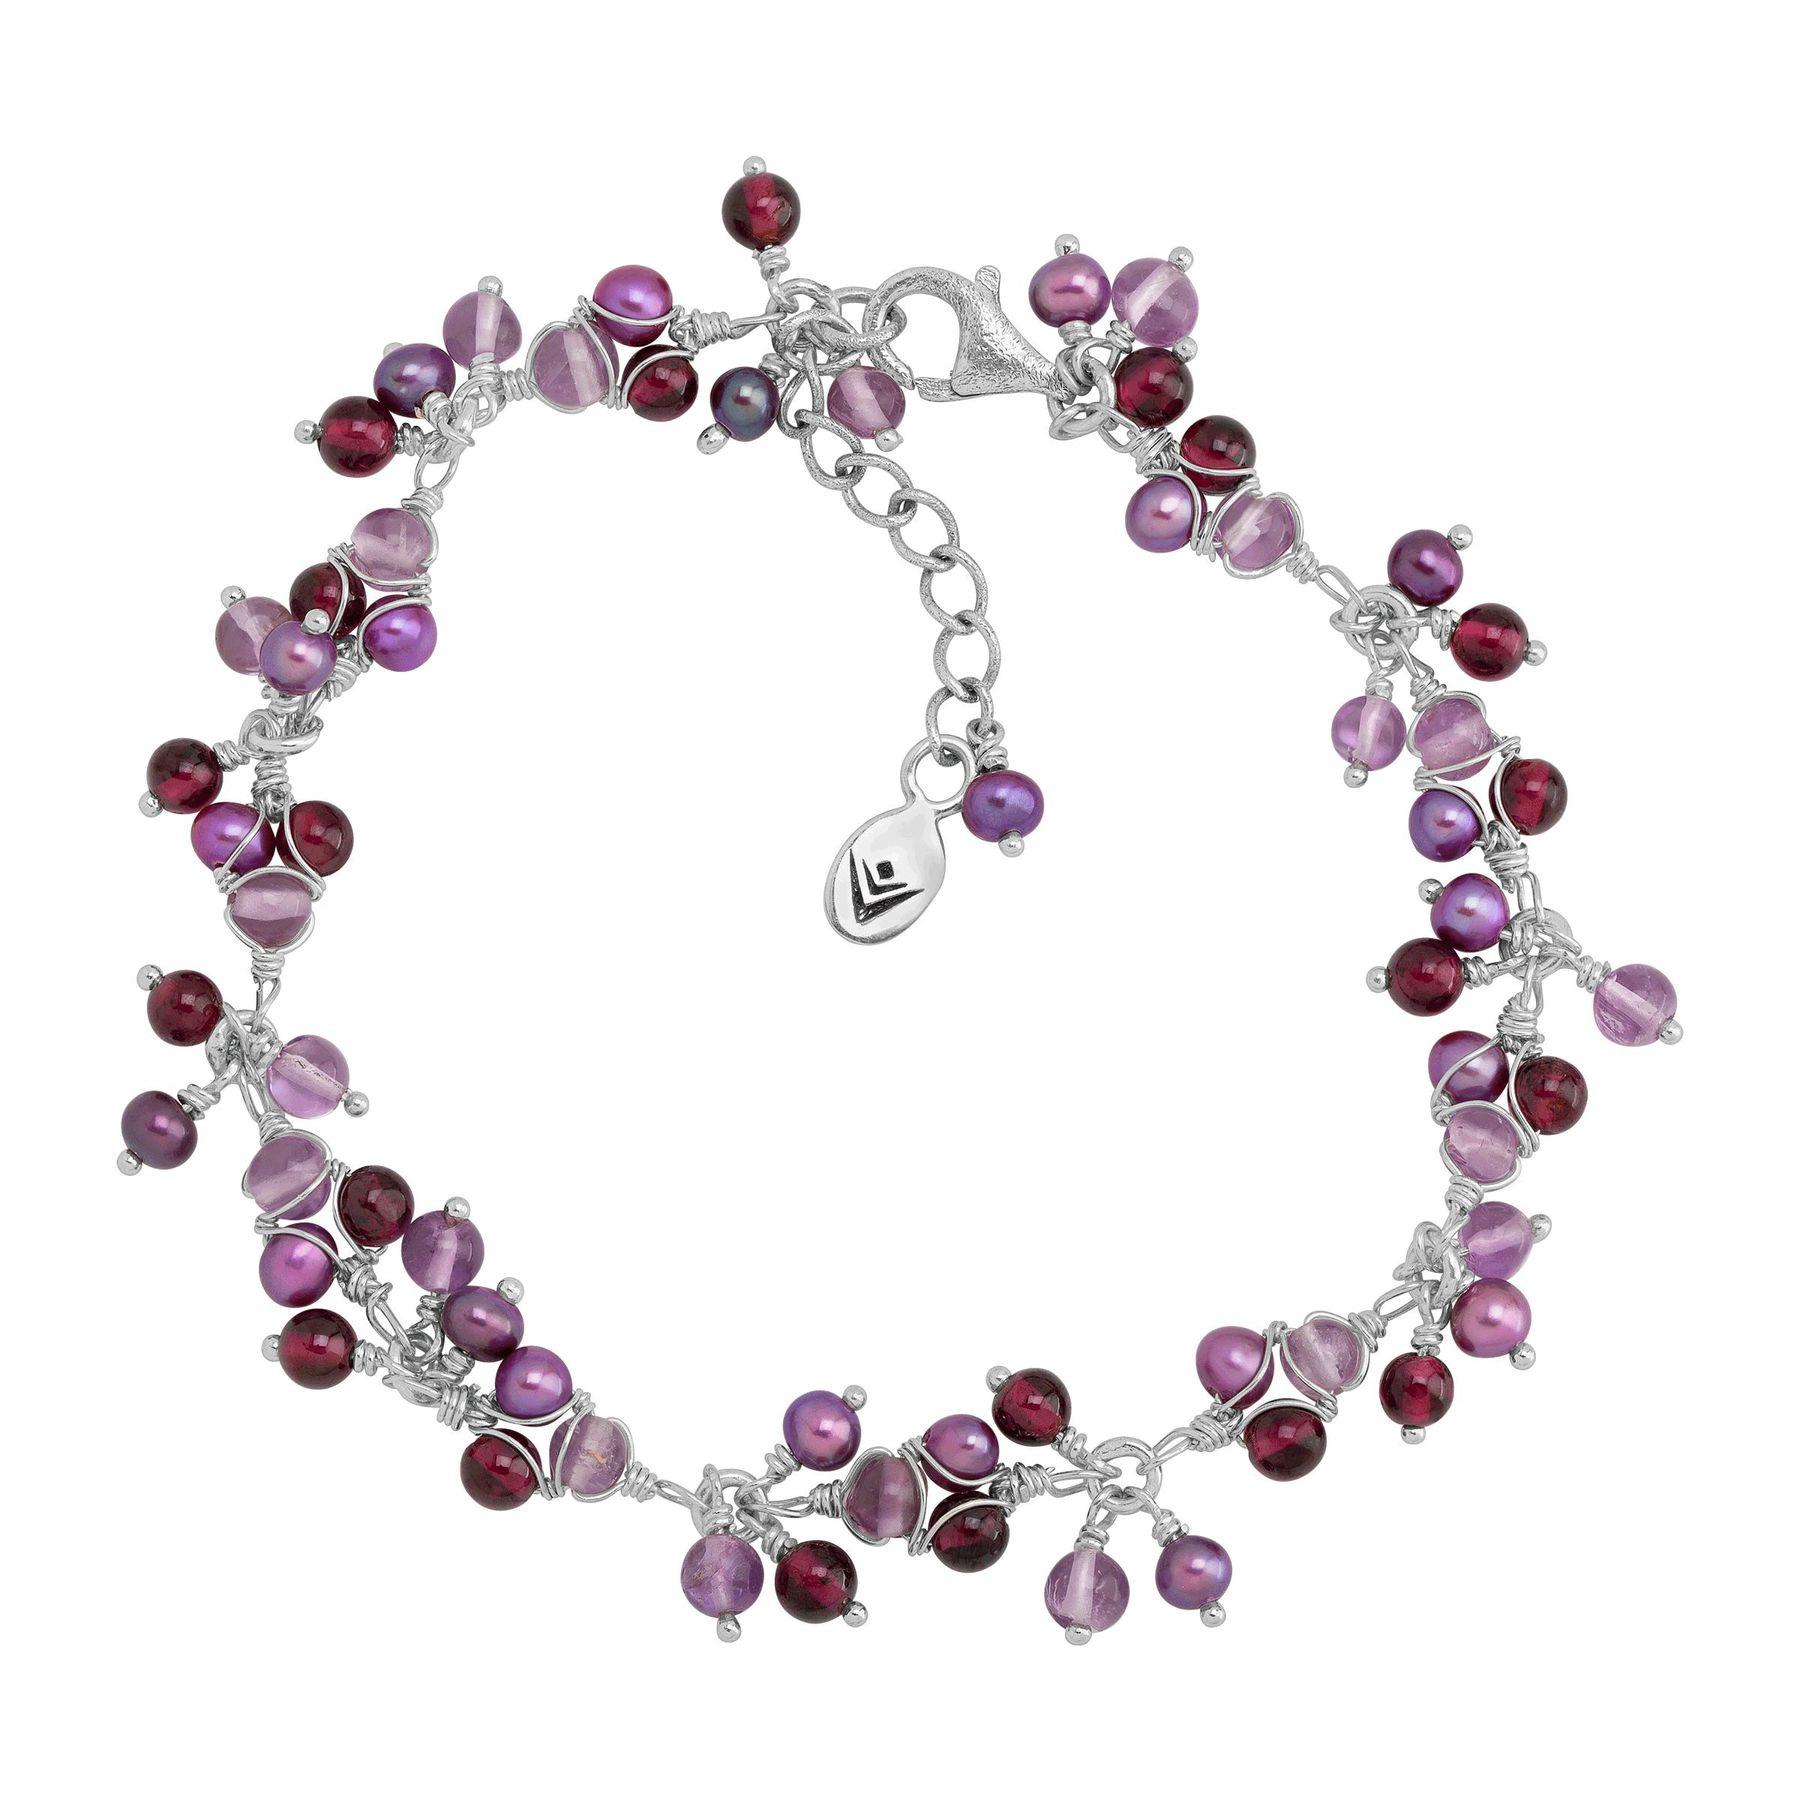 Natural Pearl Earrings Jewelry Various Colors Elegant Beautiful Earrings 7-8 mm